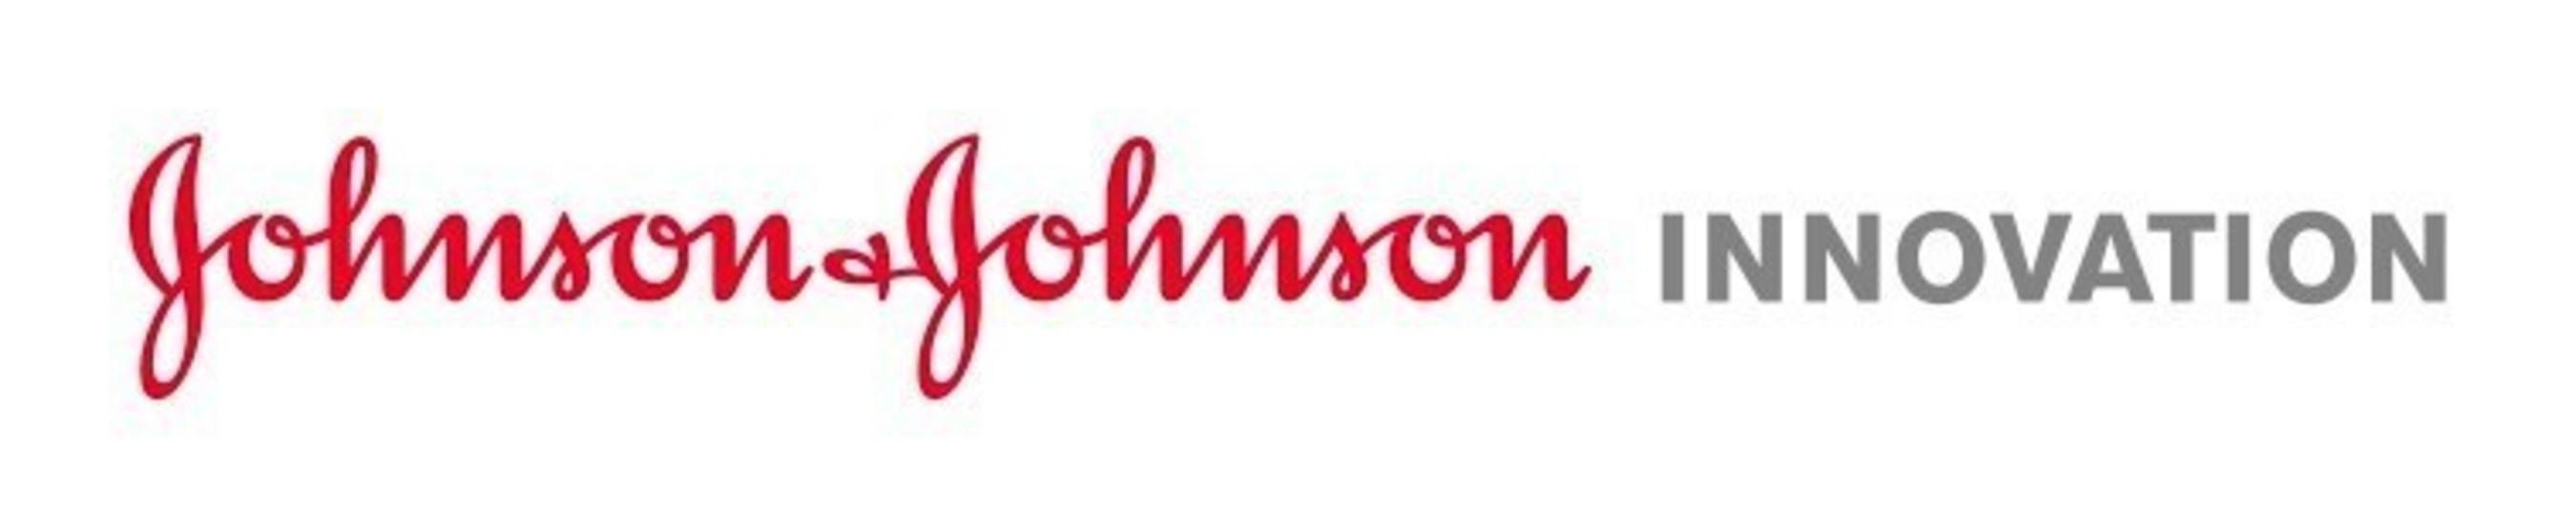 Johnson & Johnson Innovation Announces New Collaboration with Texas